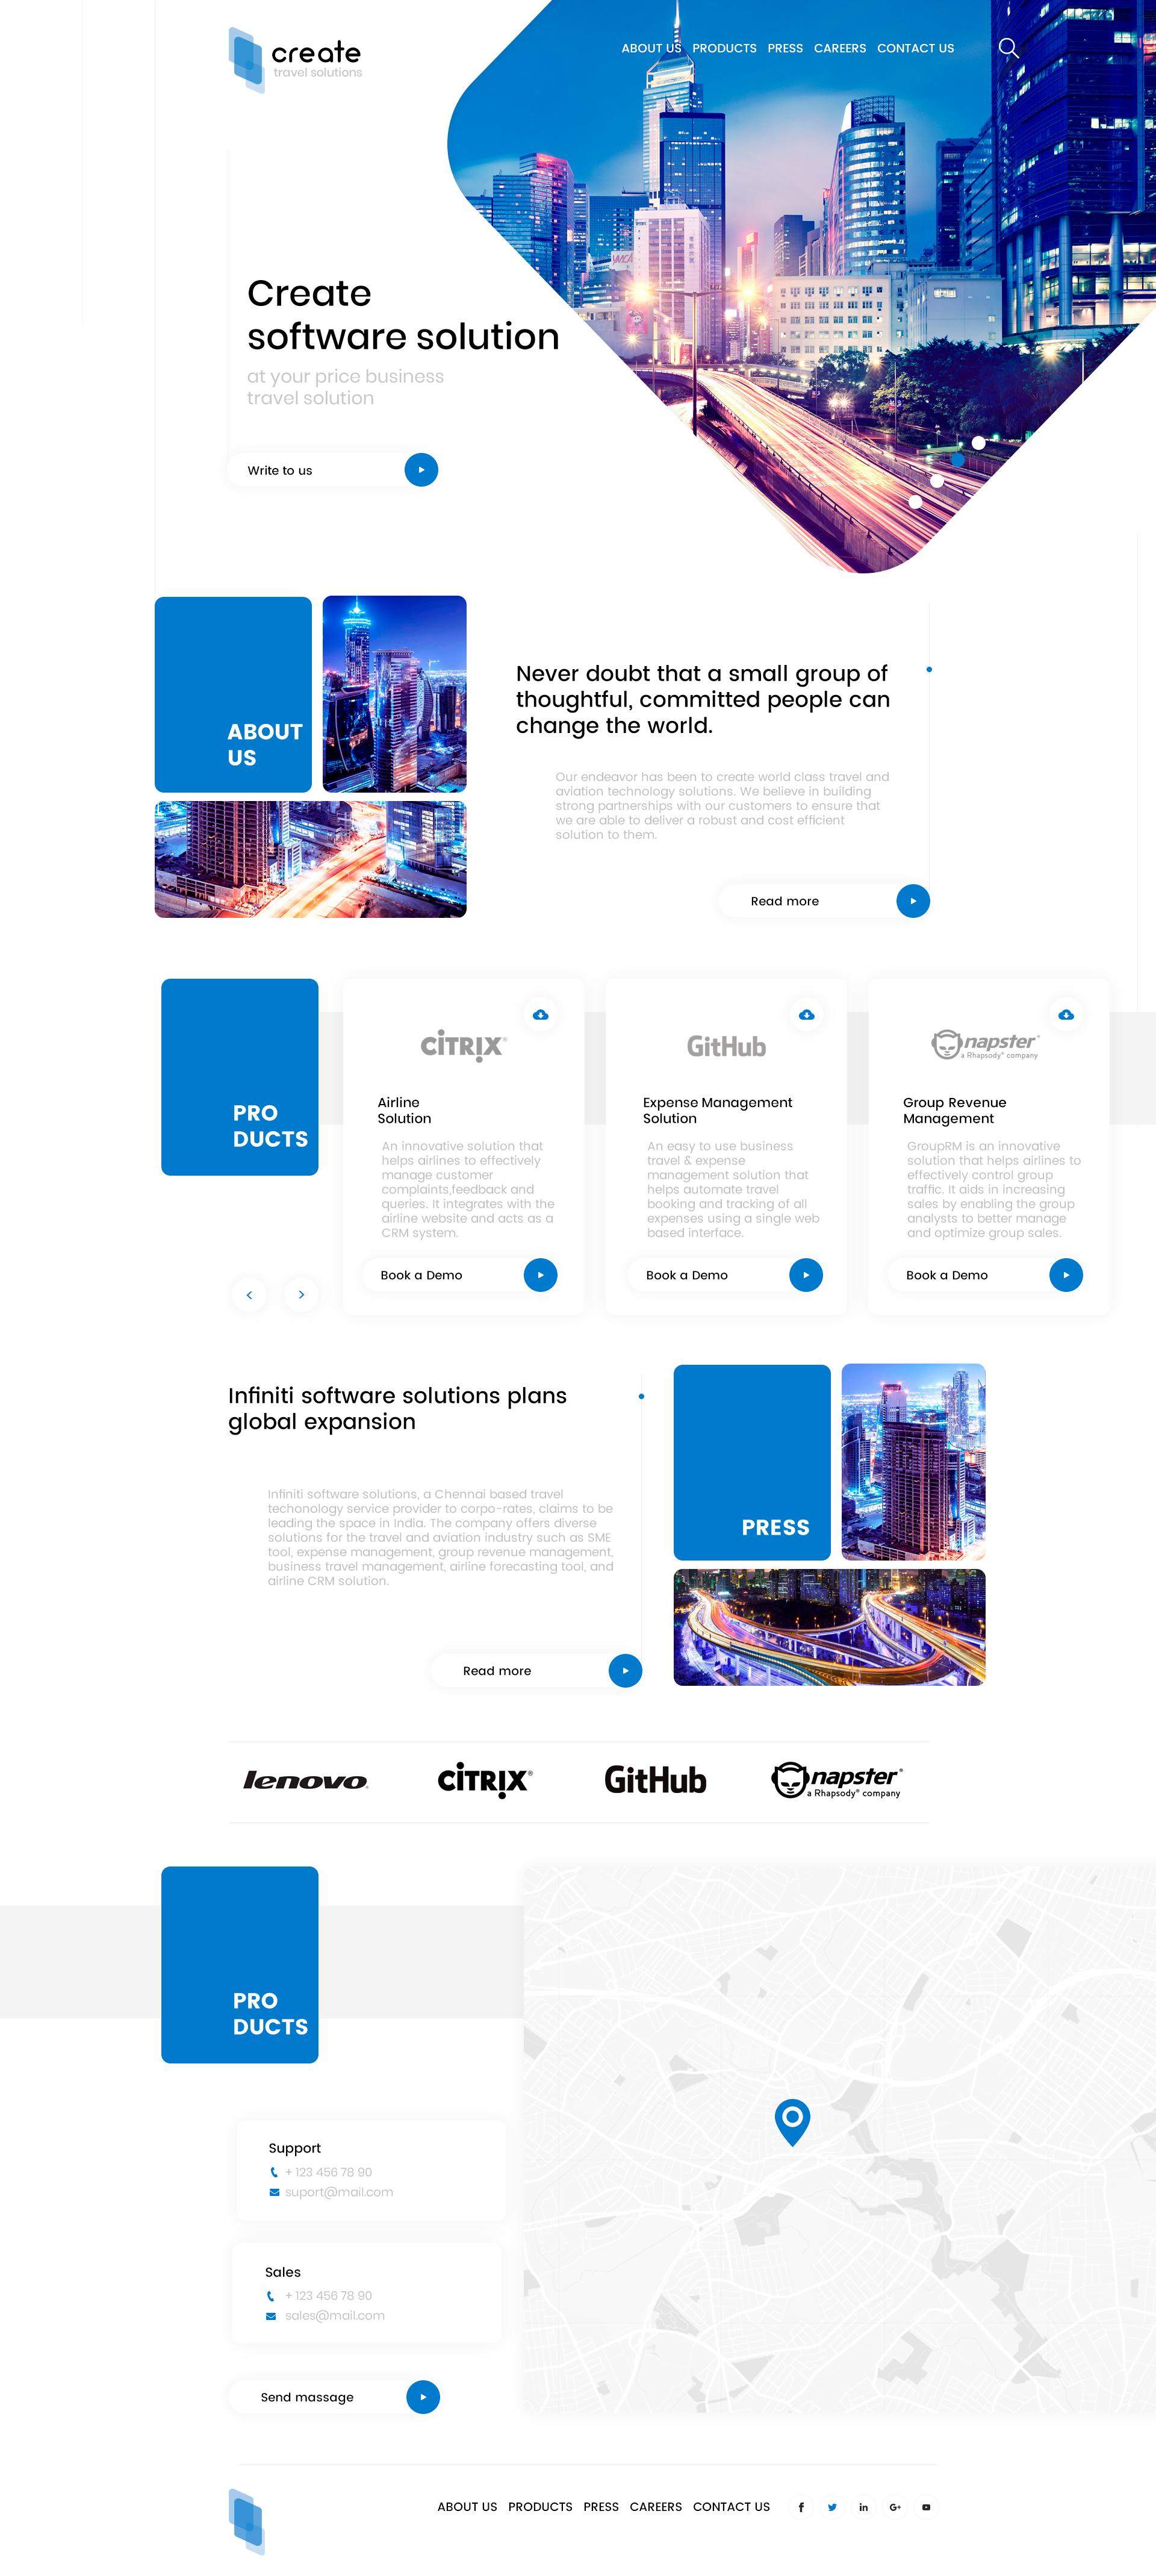 Marketing Agency Websites 10 Gorgeous Examples Hook Agency Marketing Agency Agency Website Design Digital Marketing Agency